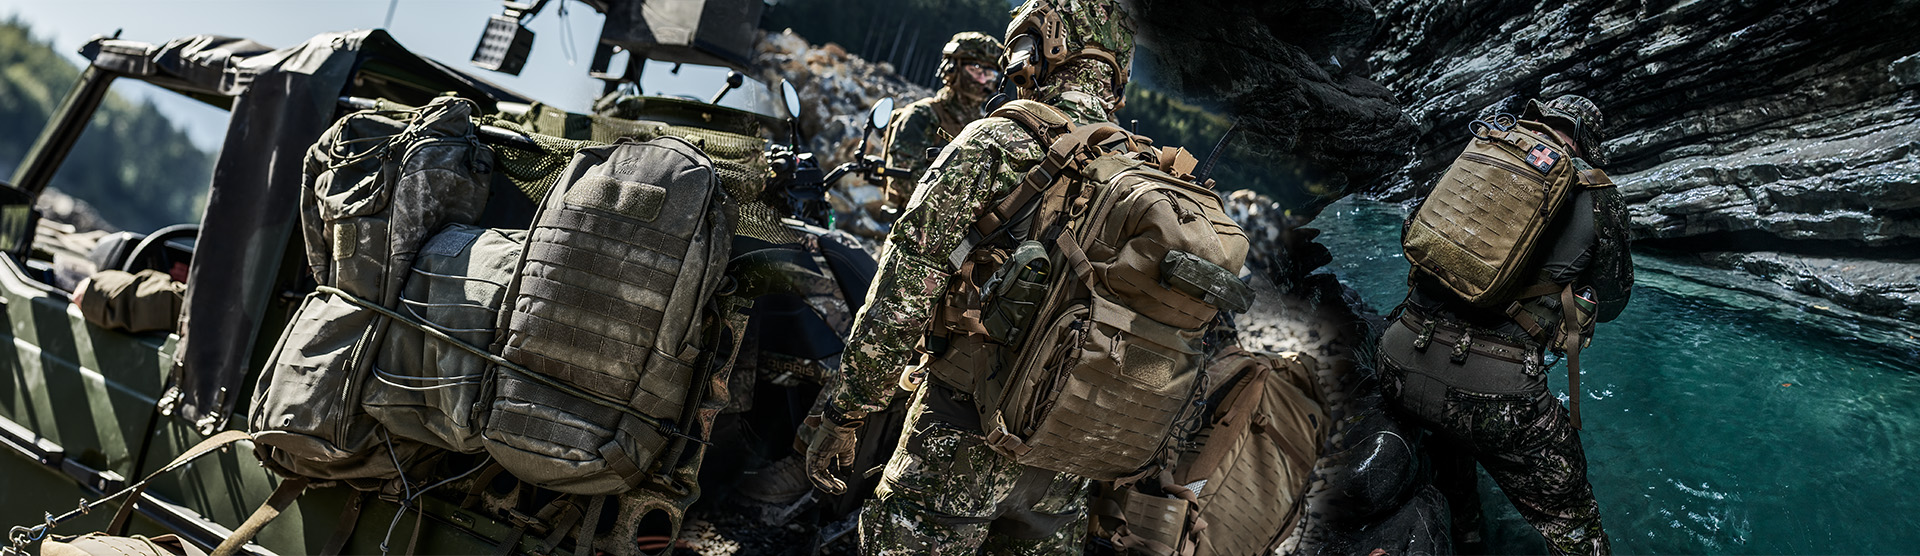 Militär Rucksack